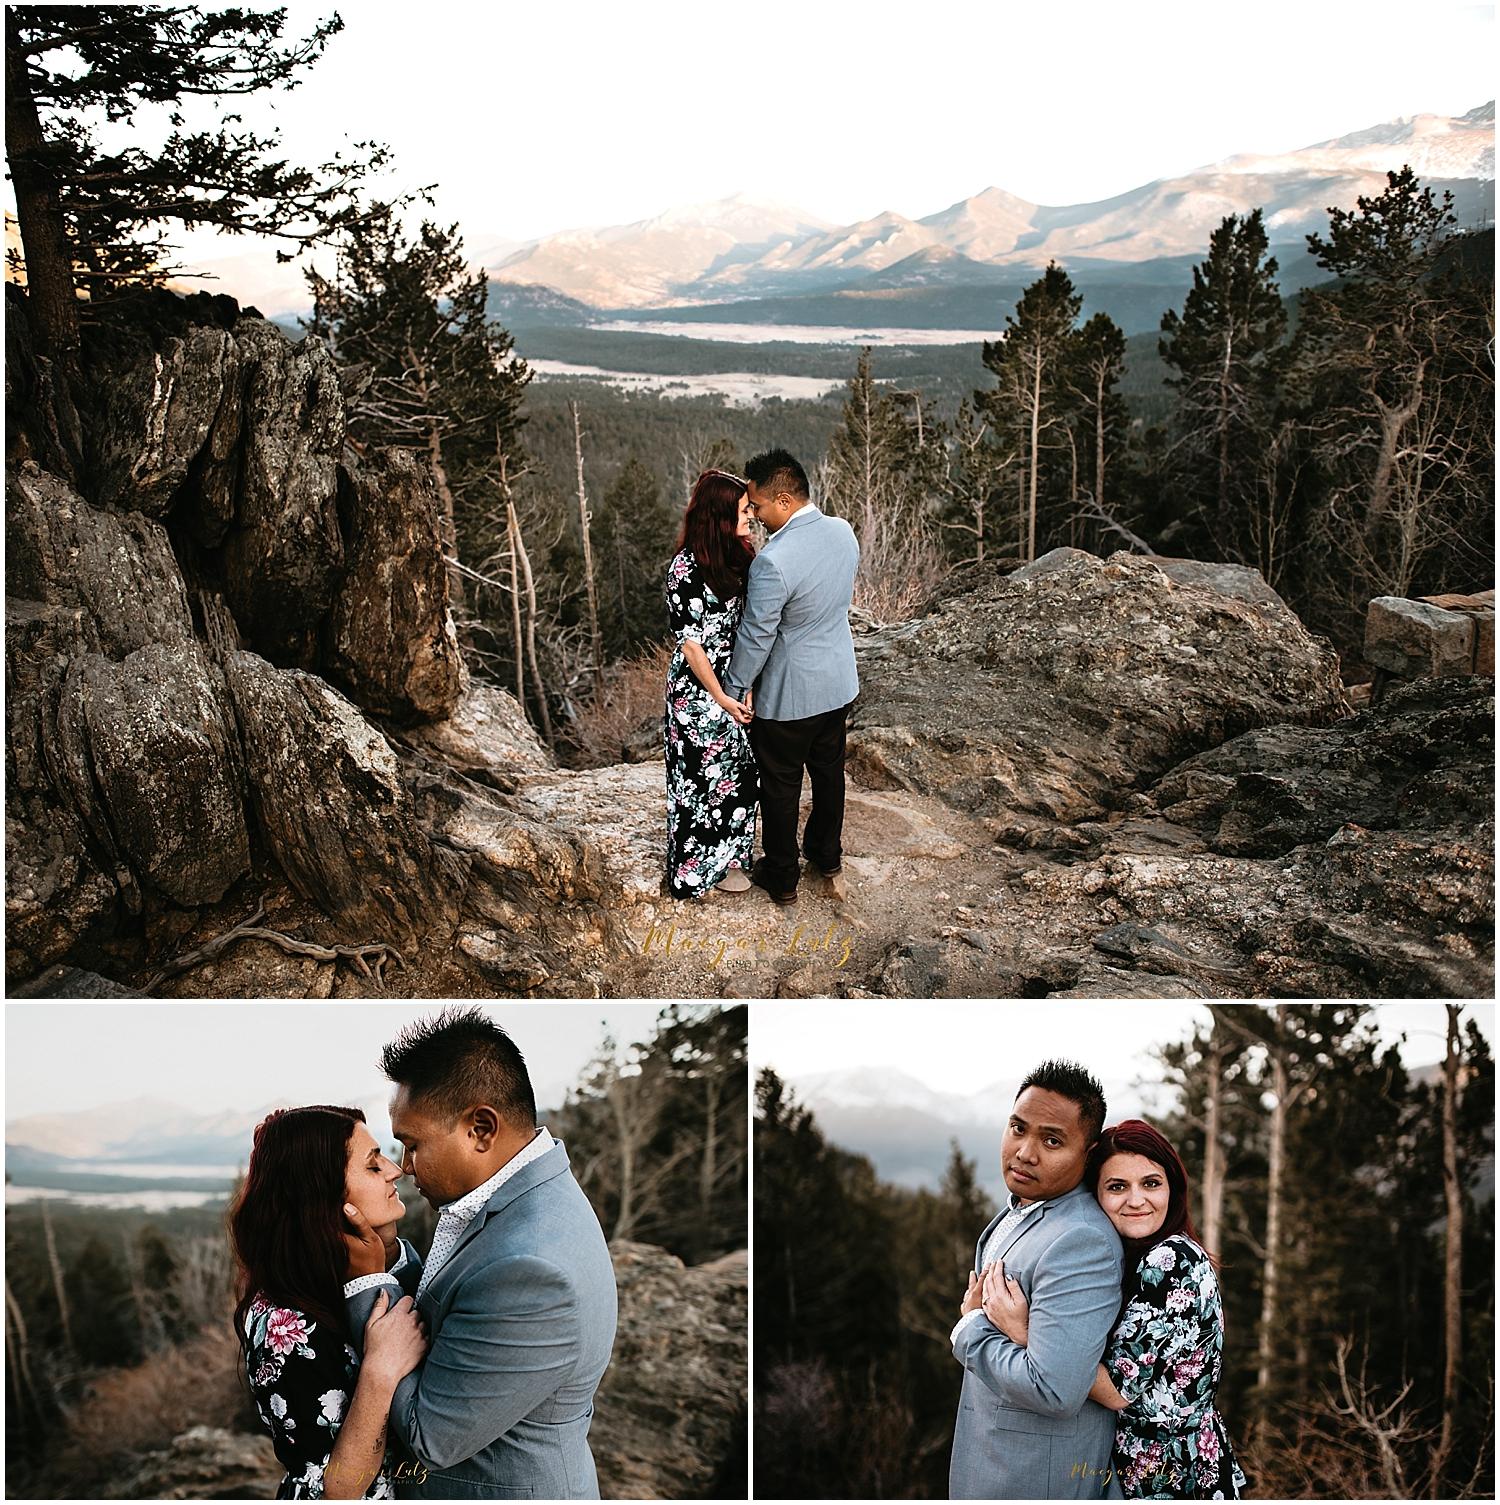 Destination-engagement-wedding-photographer-Colorado-Rocky-Mountain-National-Park-Session_0049.jpg